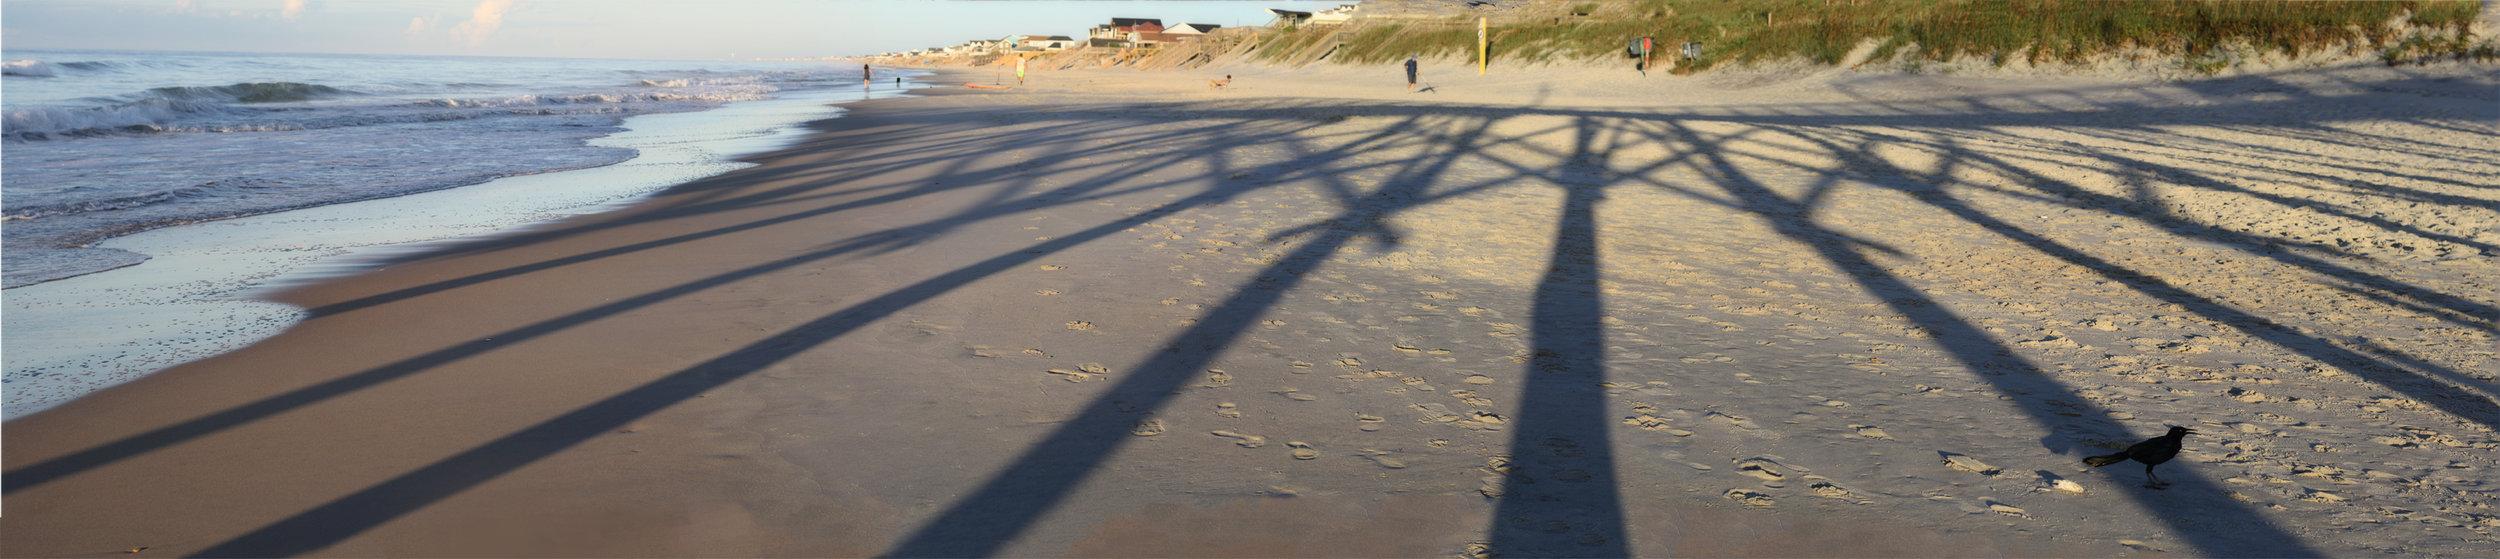 Surf City Pier Shadow, Topsail Island, NC, August 2016